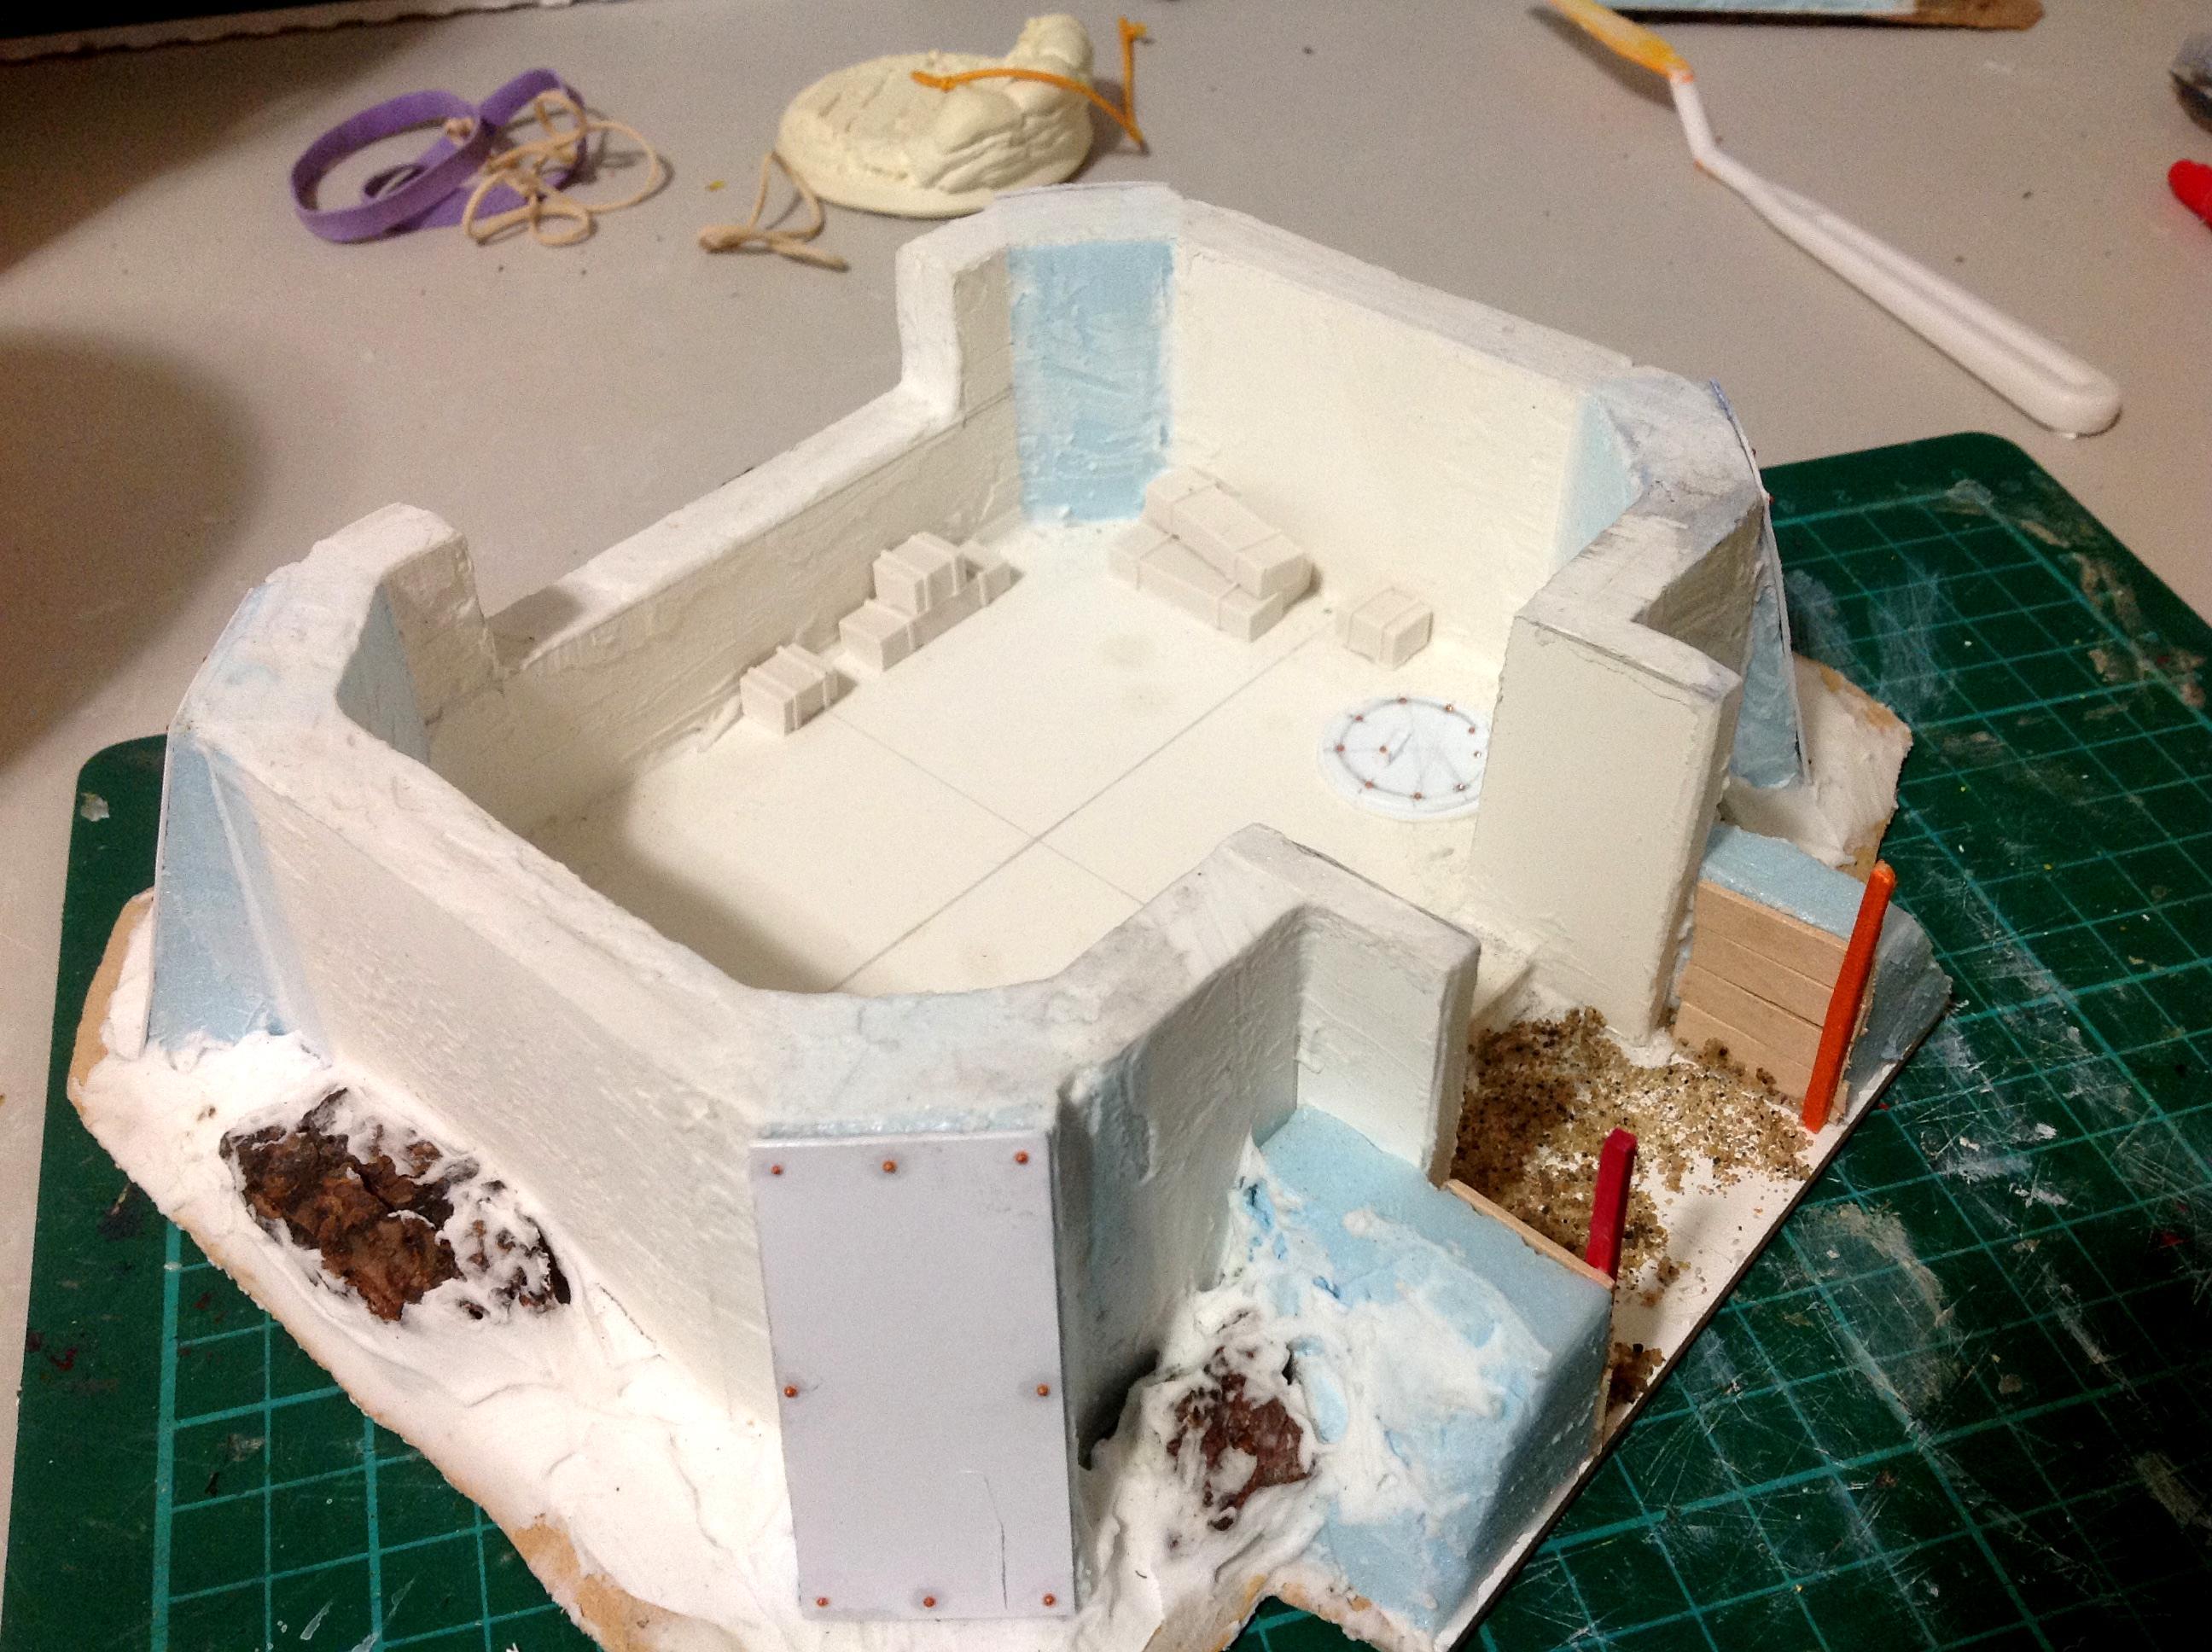 Bunker, Terrain, Trench, Work In Progress